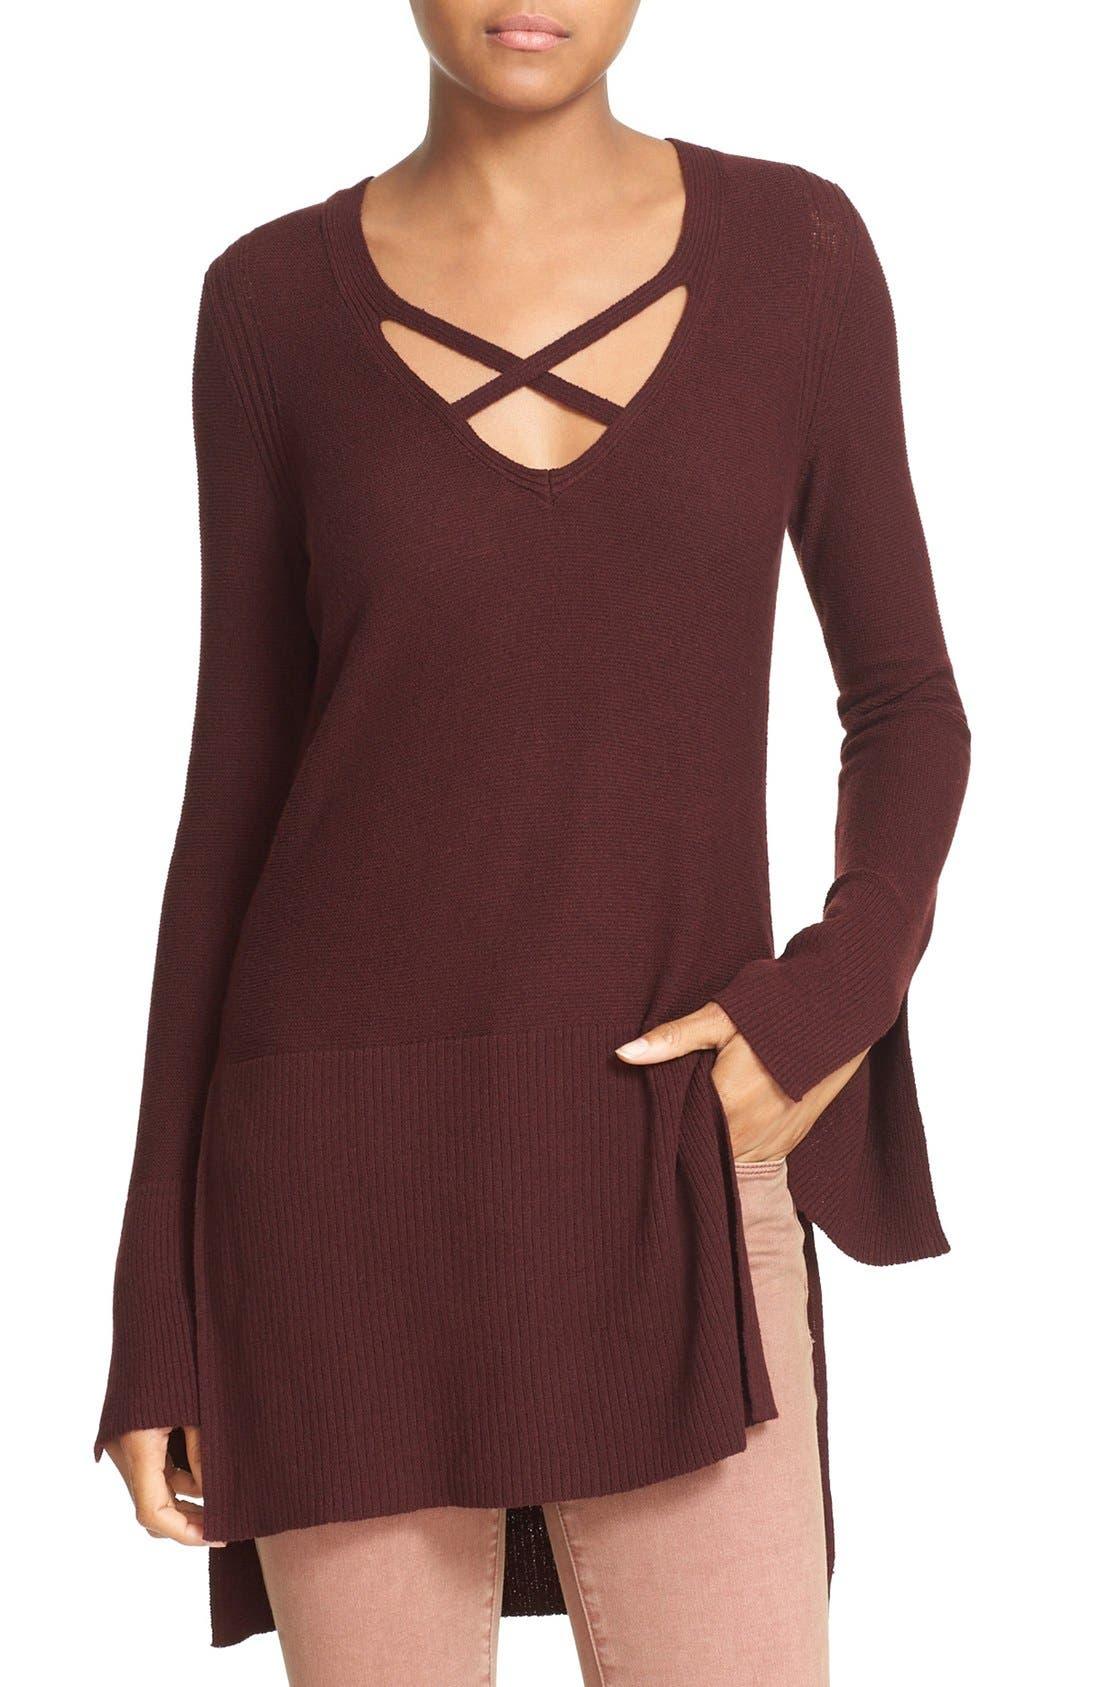 Alternate Image 1 Selected - Free People Crisscross Sweater